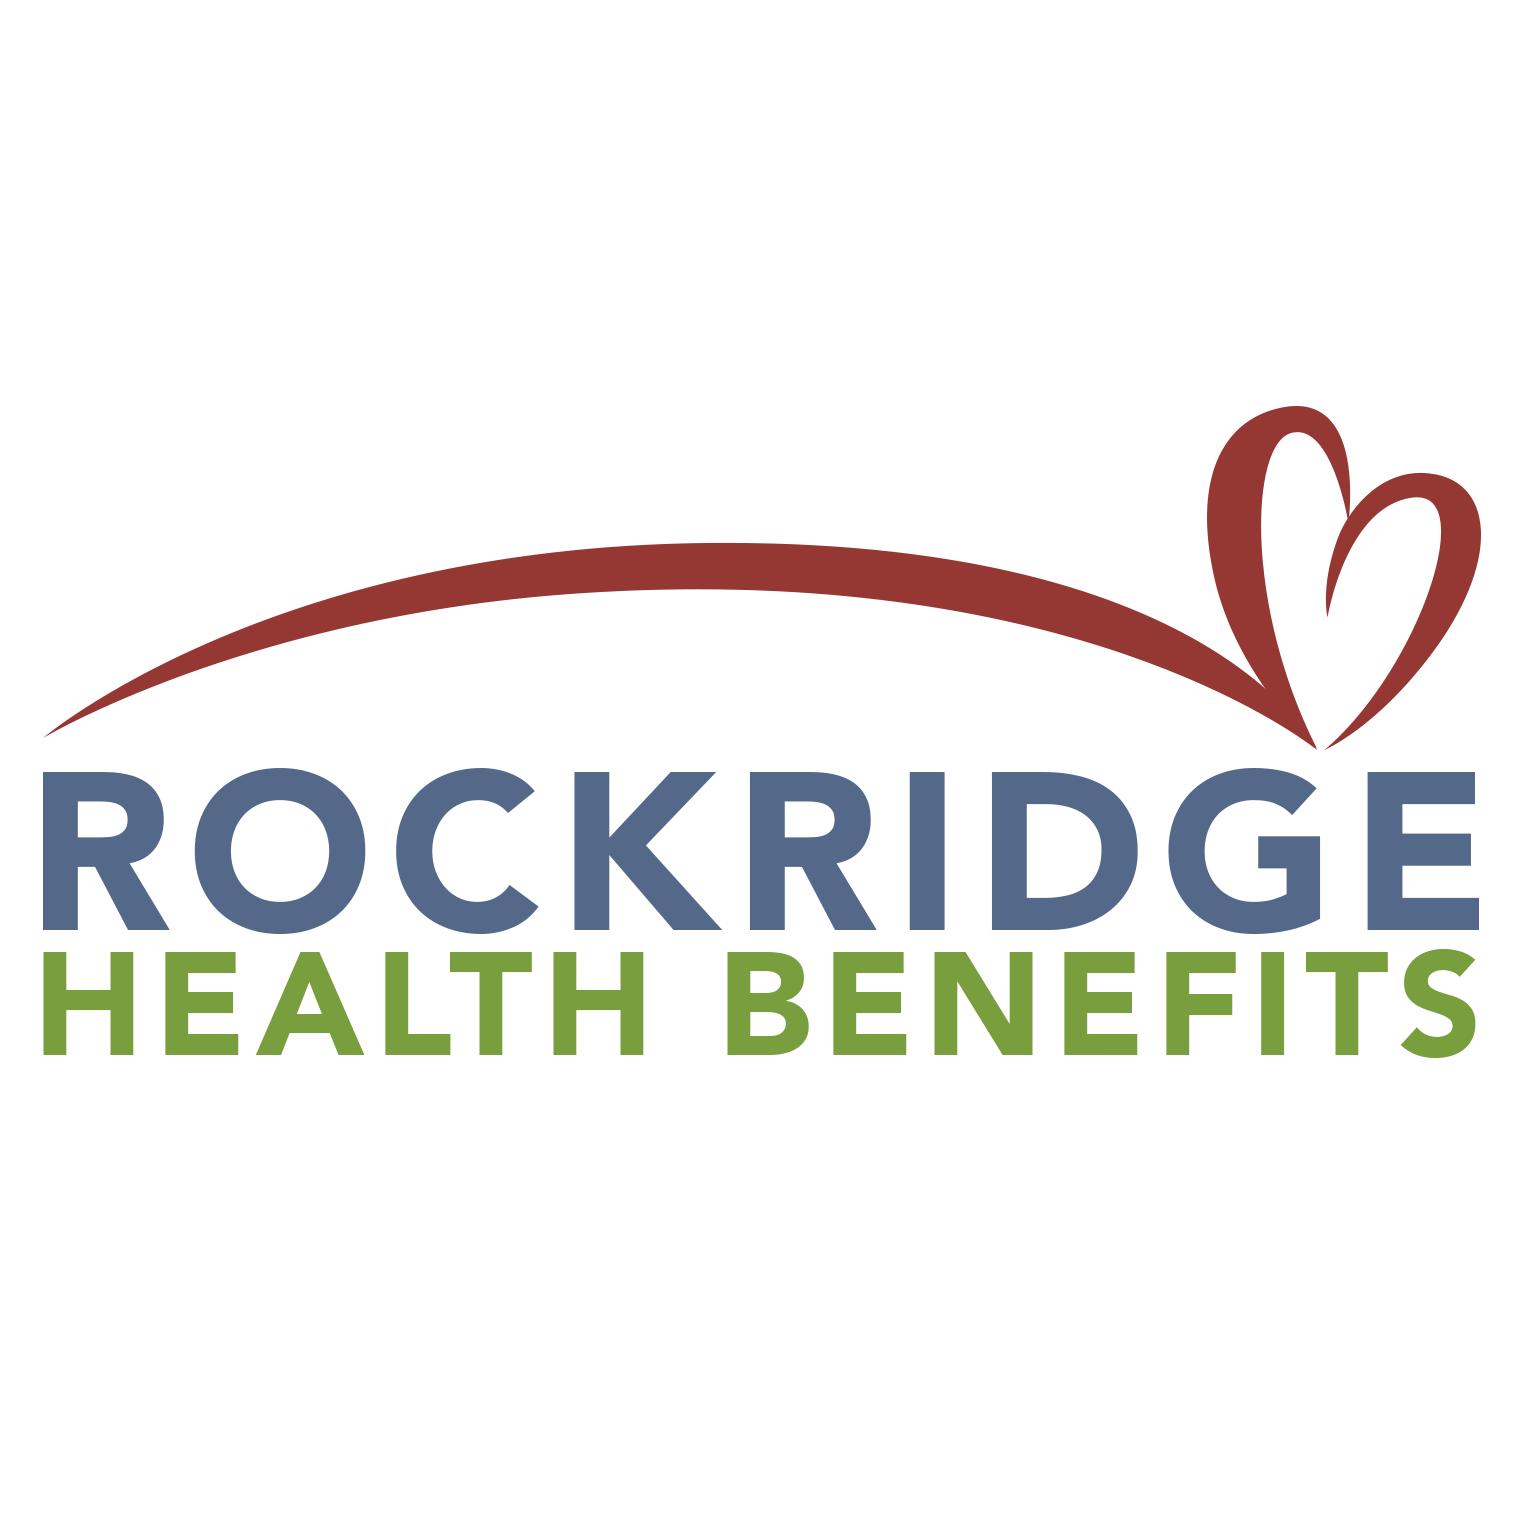 Rockridge Health Benefits